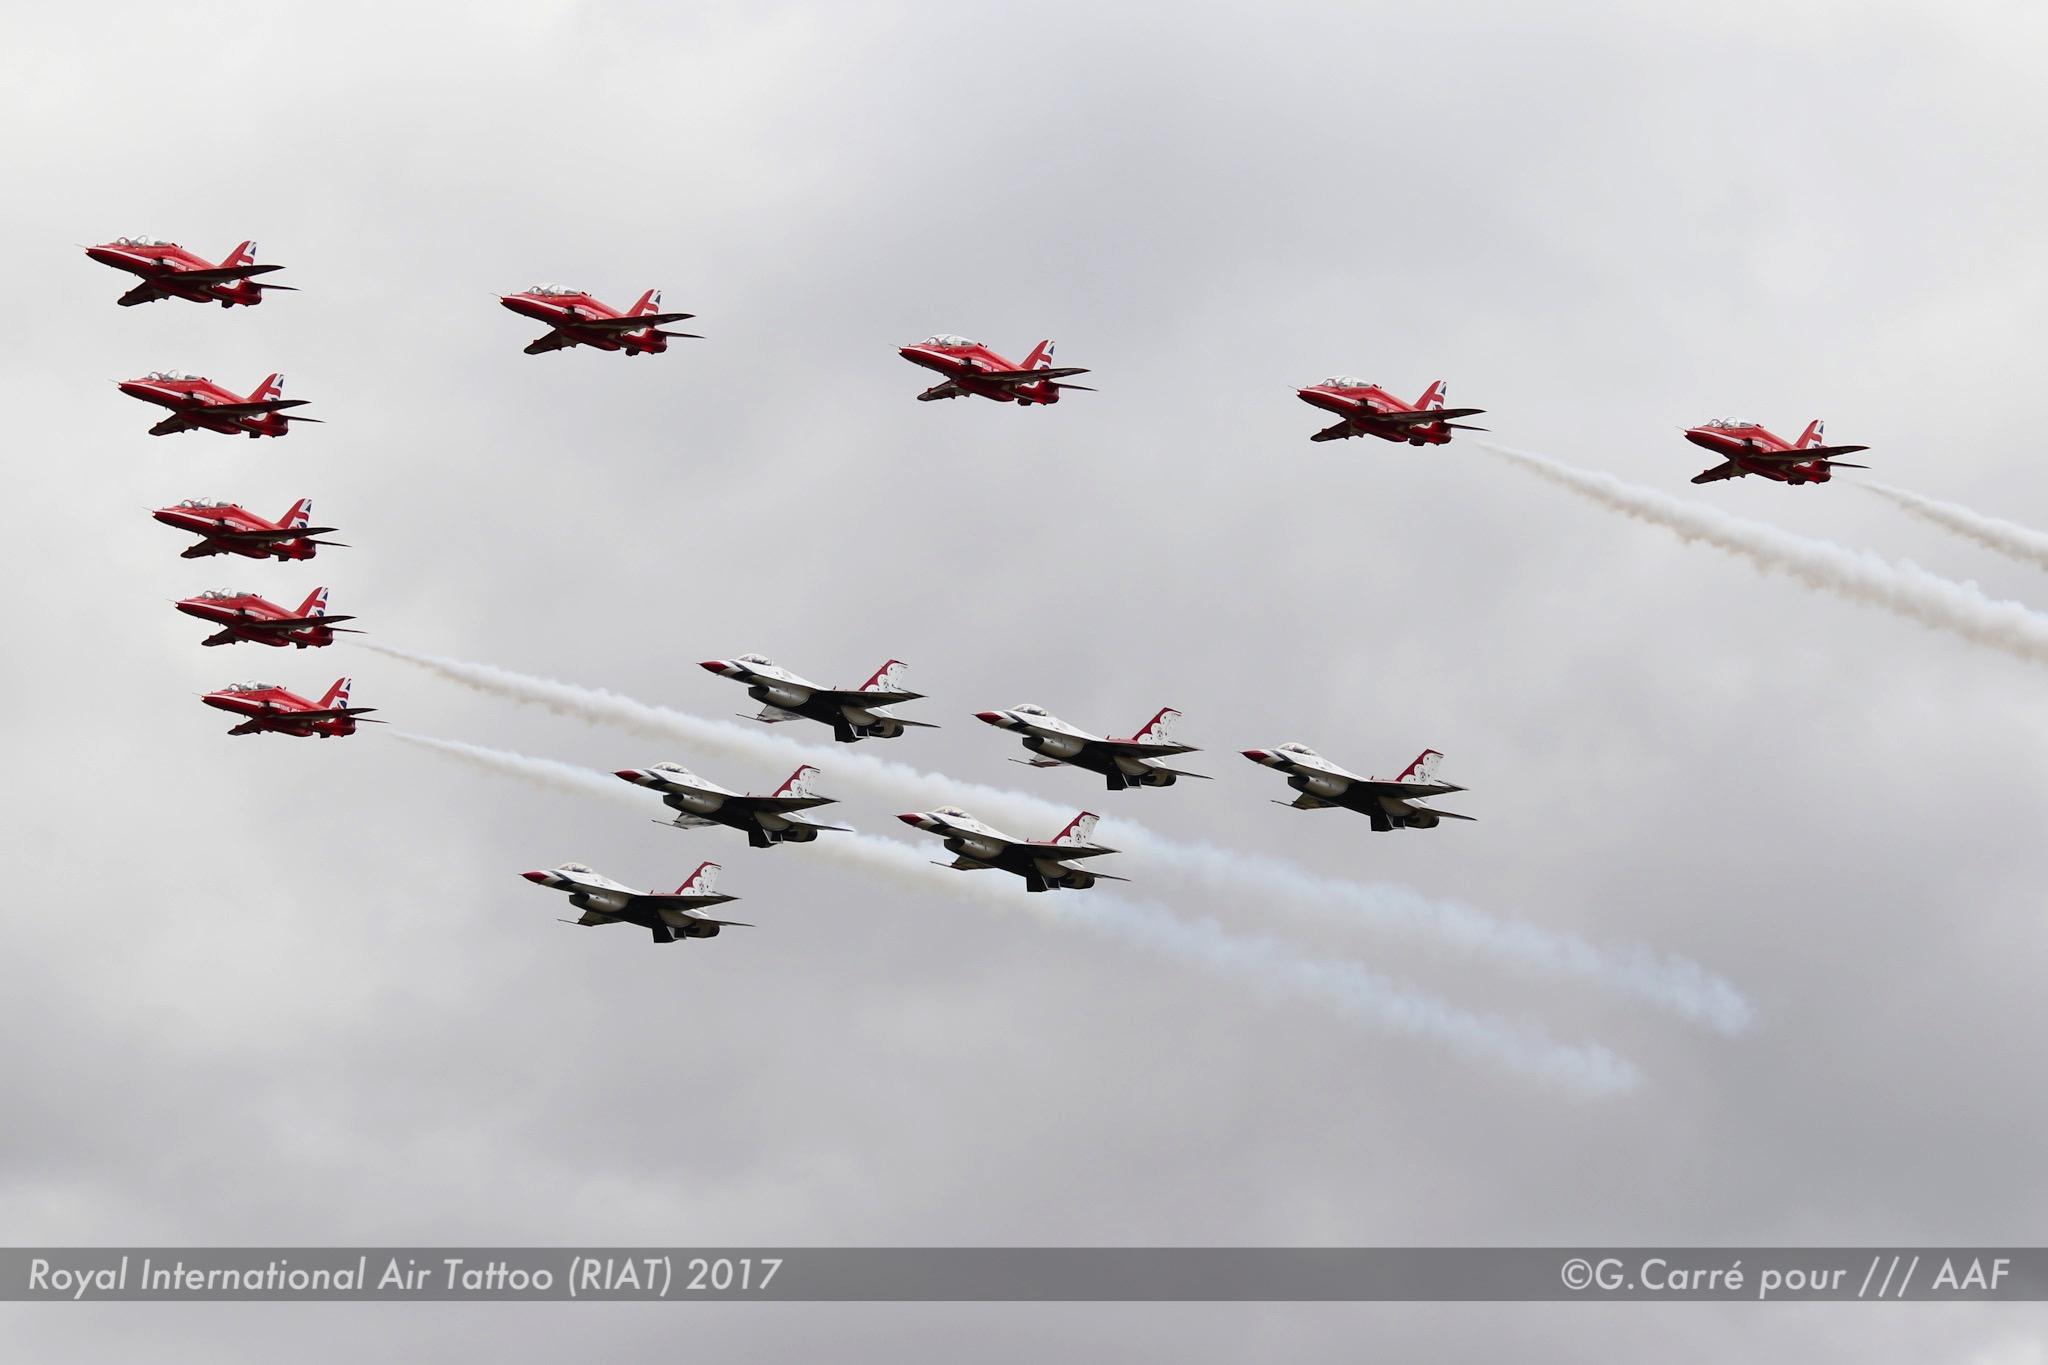 Red Arrows + Thunderbirds